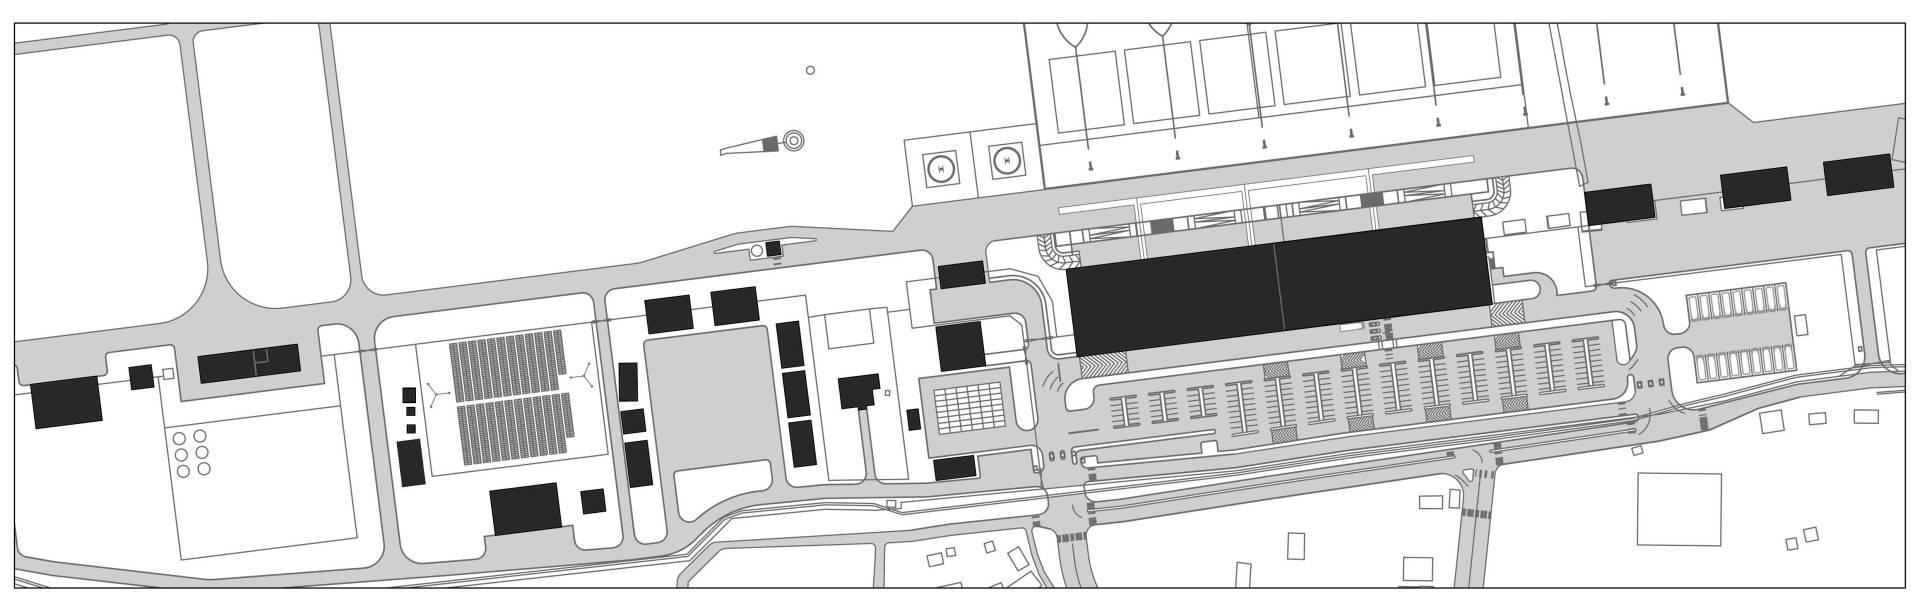 Monokroma Architect Labuan Bajo Airport Labuan Bajo Labuan Bajo Site Plan Modern  503